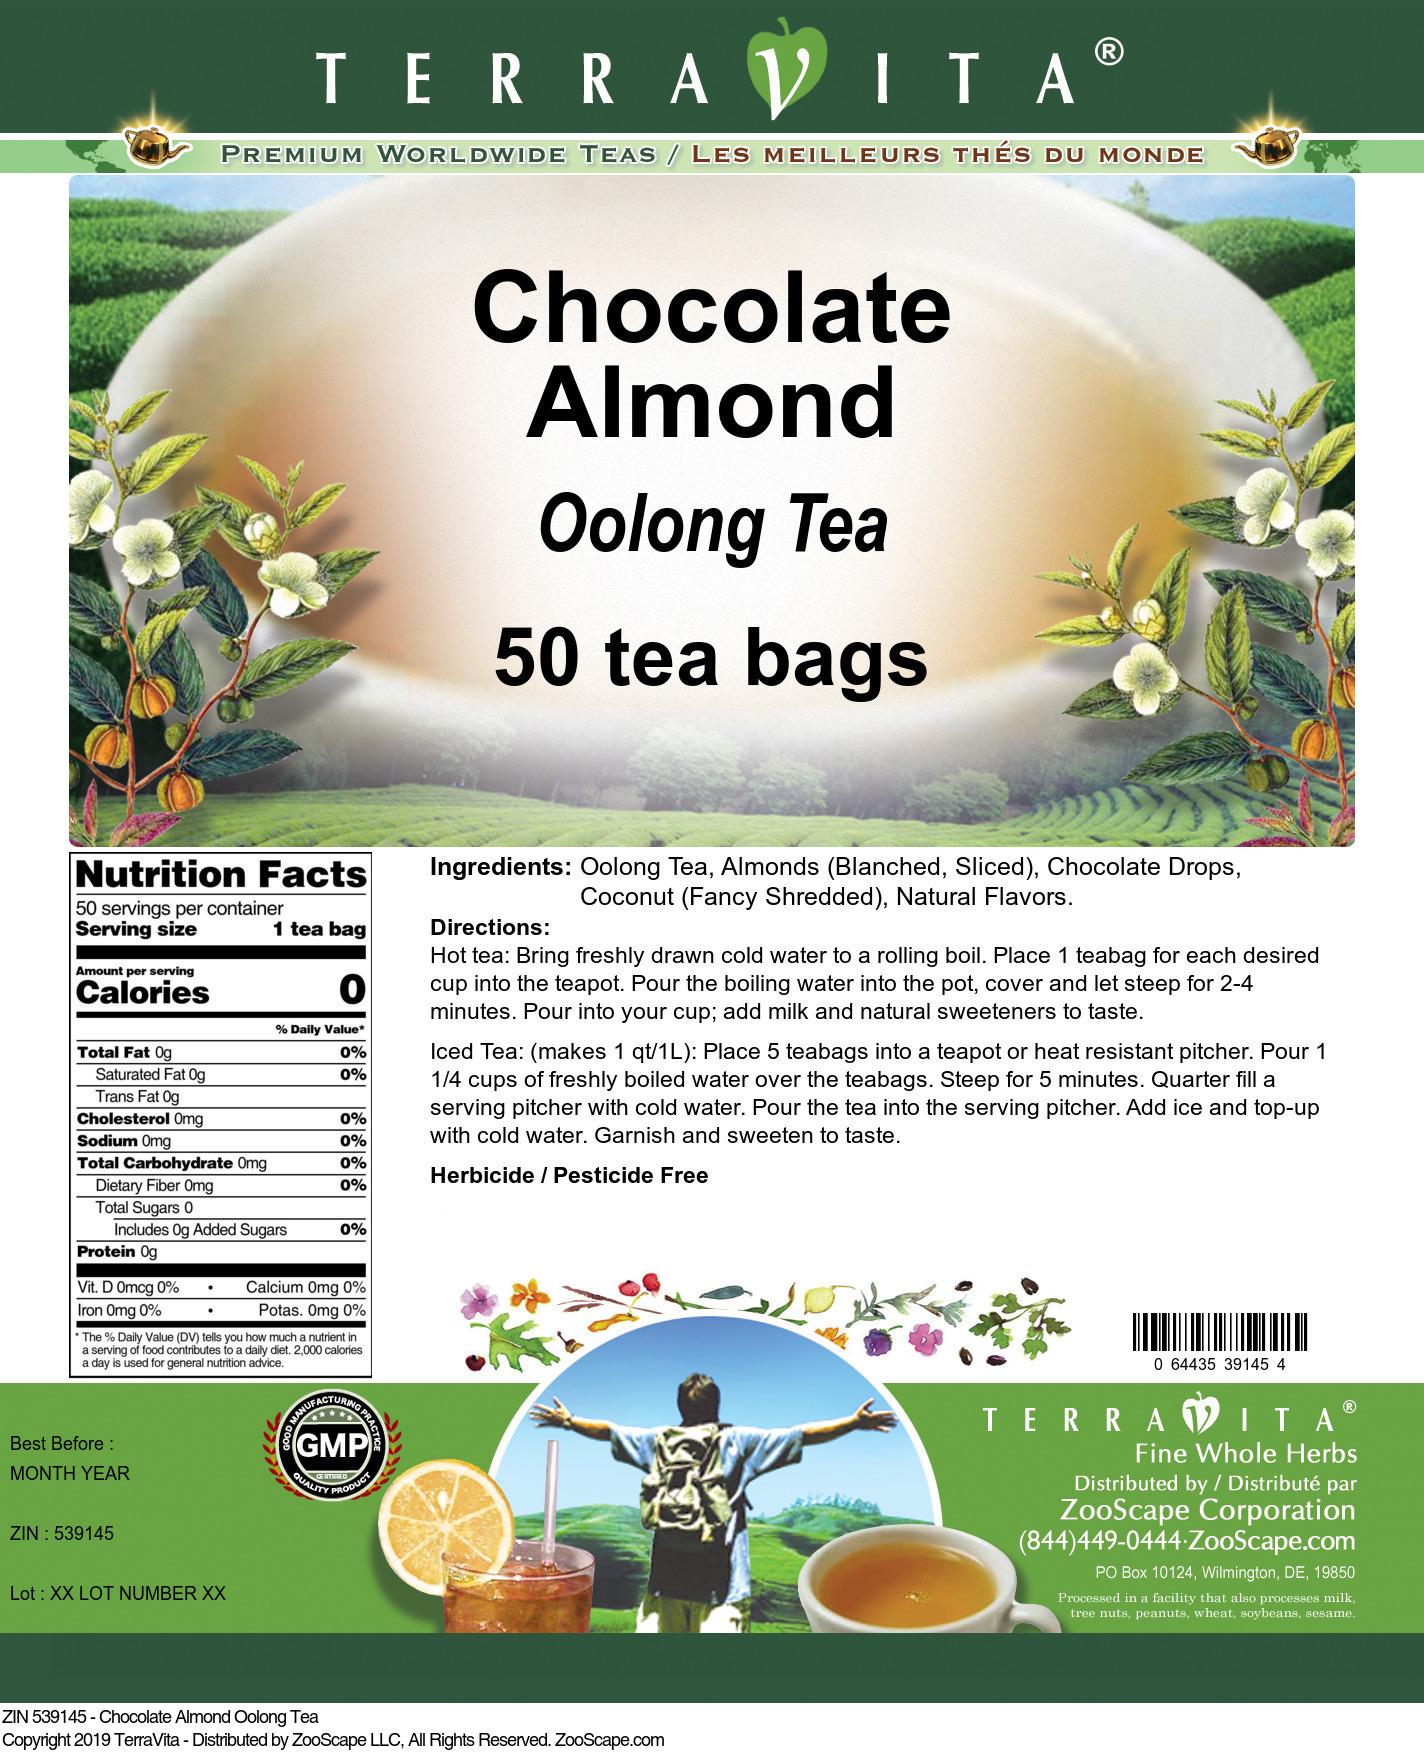 Chocolate Almond Oolong Tea